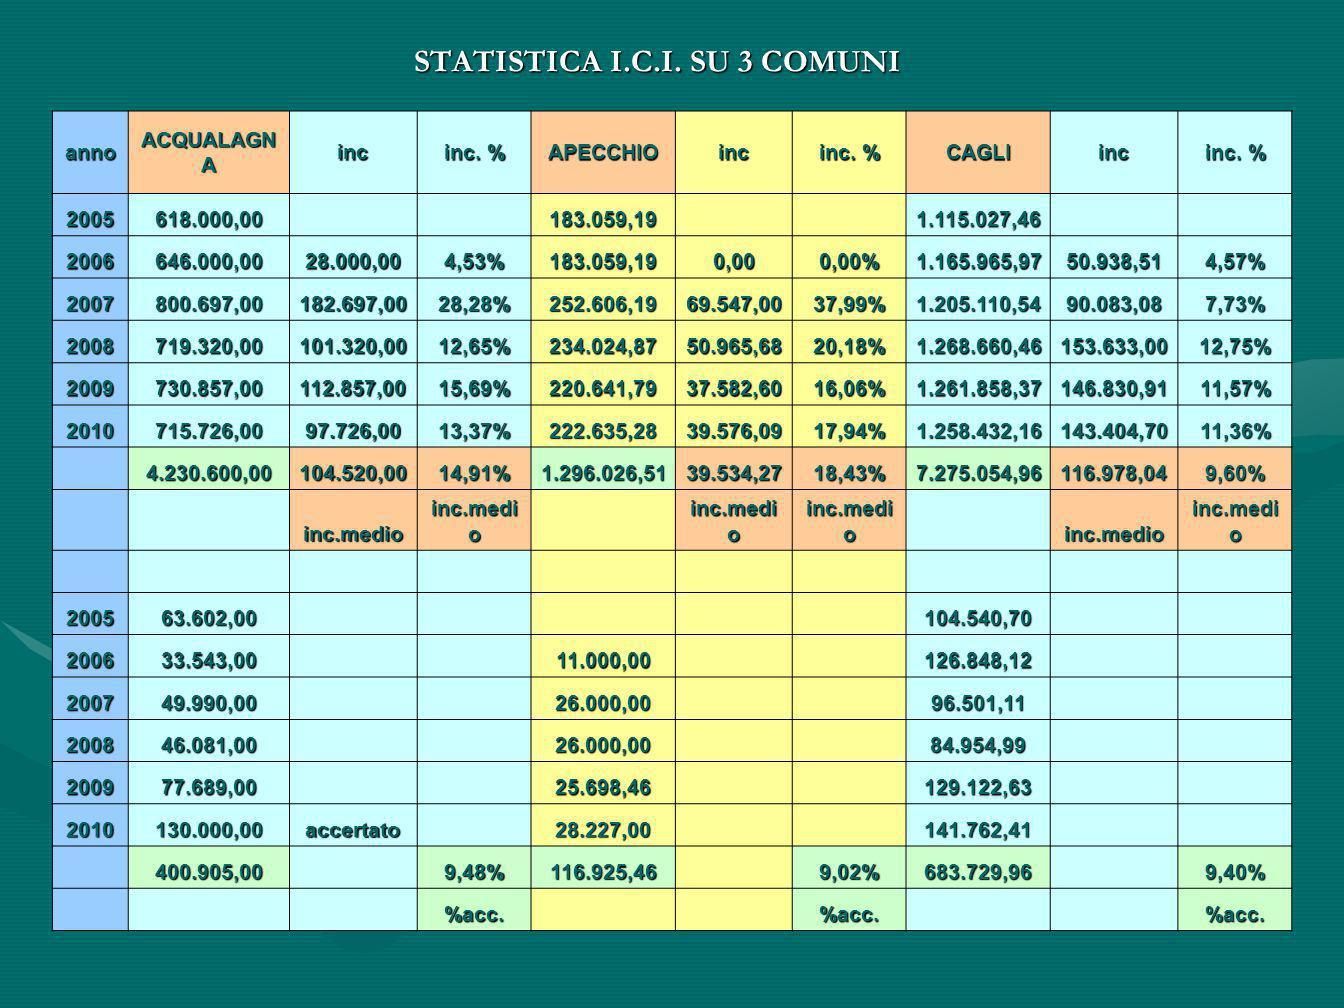 STATISTICA I.C.I. SU 3 COMUNI